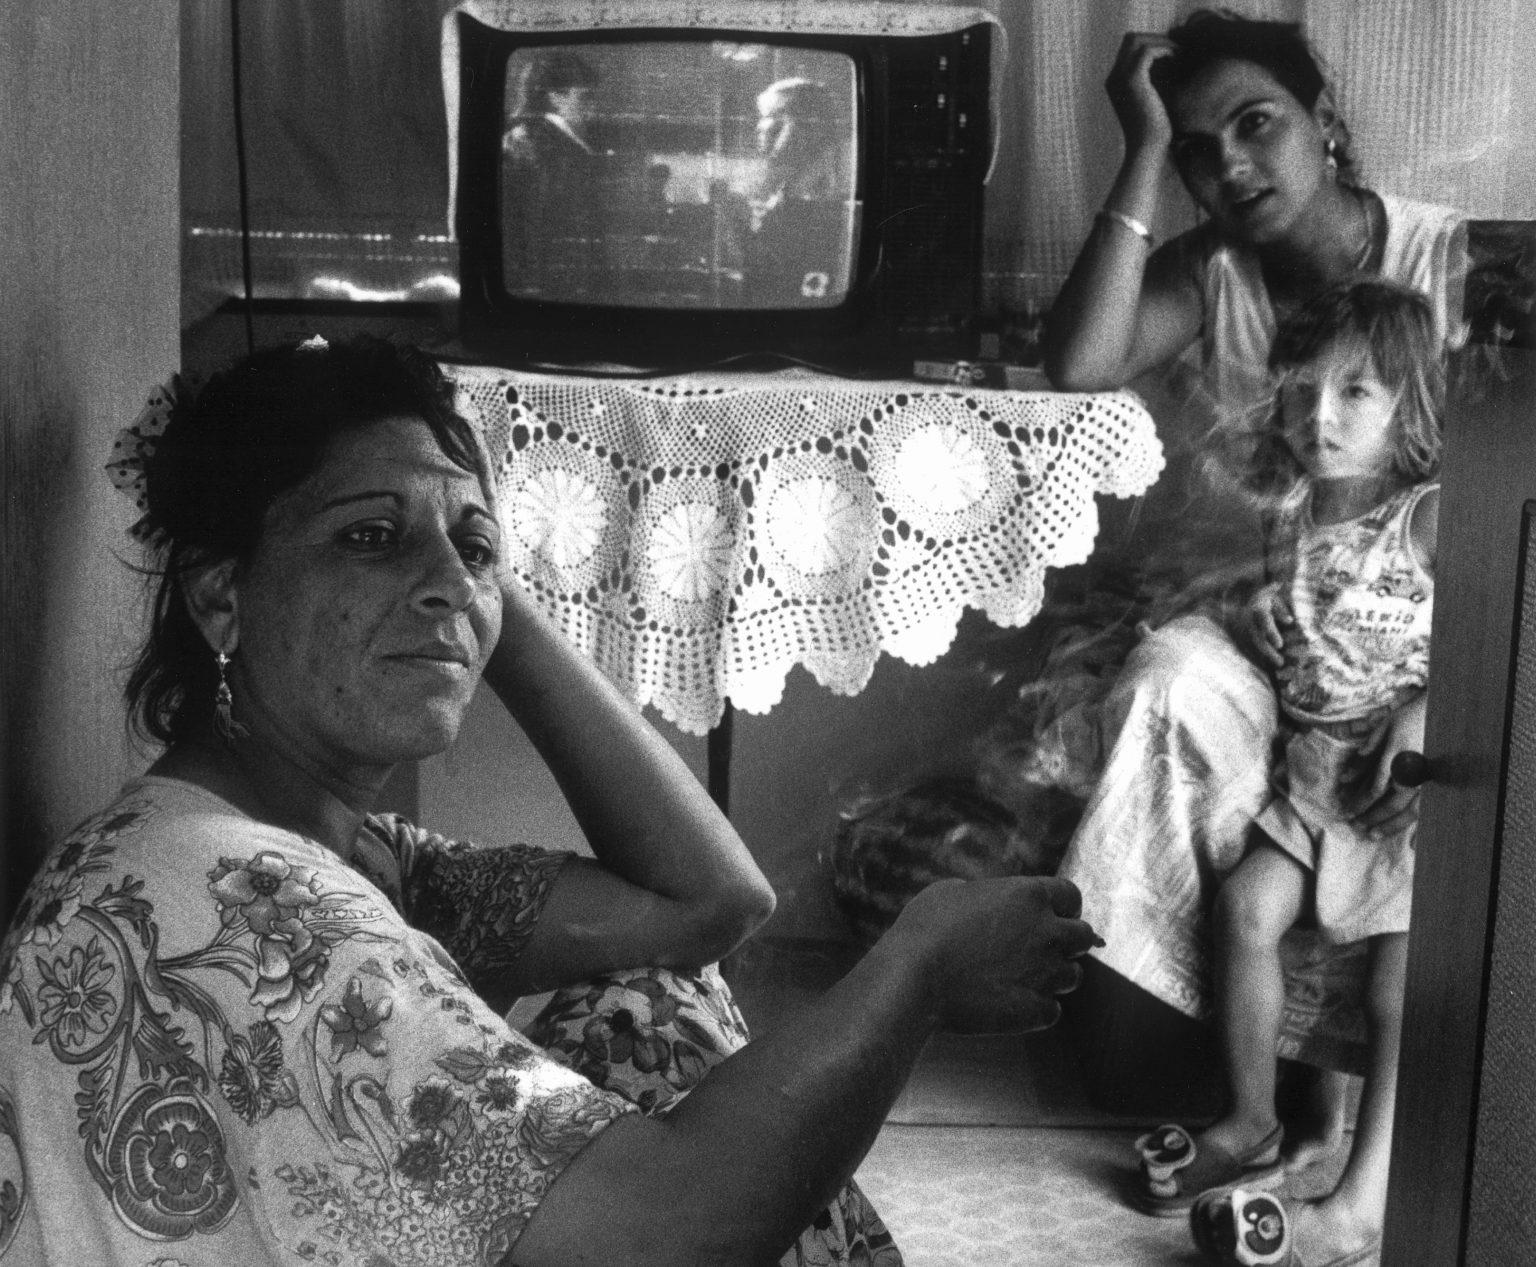 FLORENCE 1993 - GYPSIES . WITHIN THEIR HOME - FIRENZE 1993 - ZINGARI . INTERNO DI UNA ABITAZIONE .